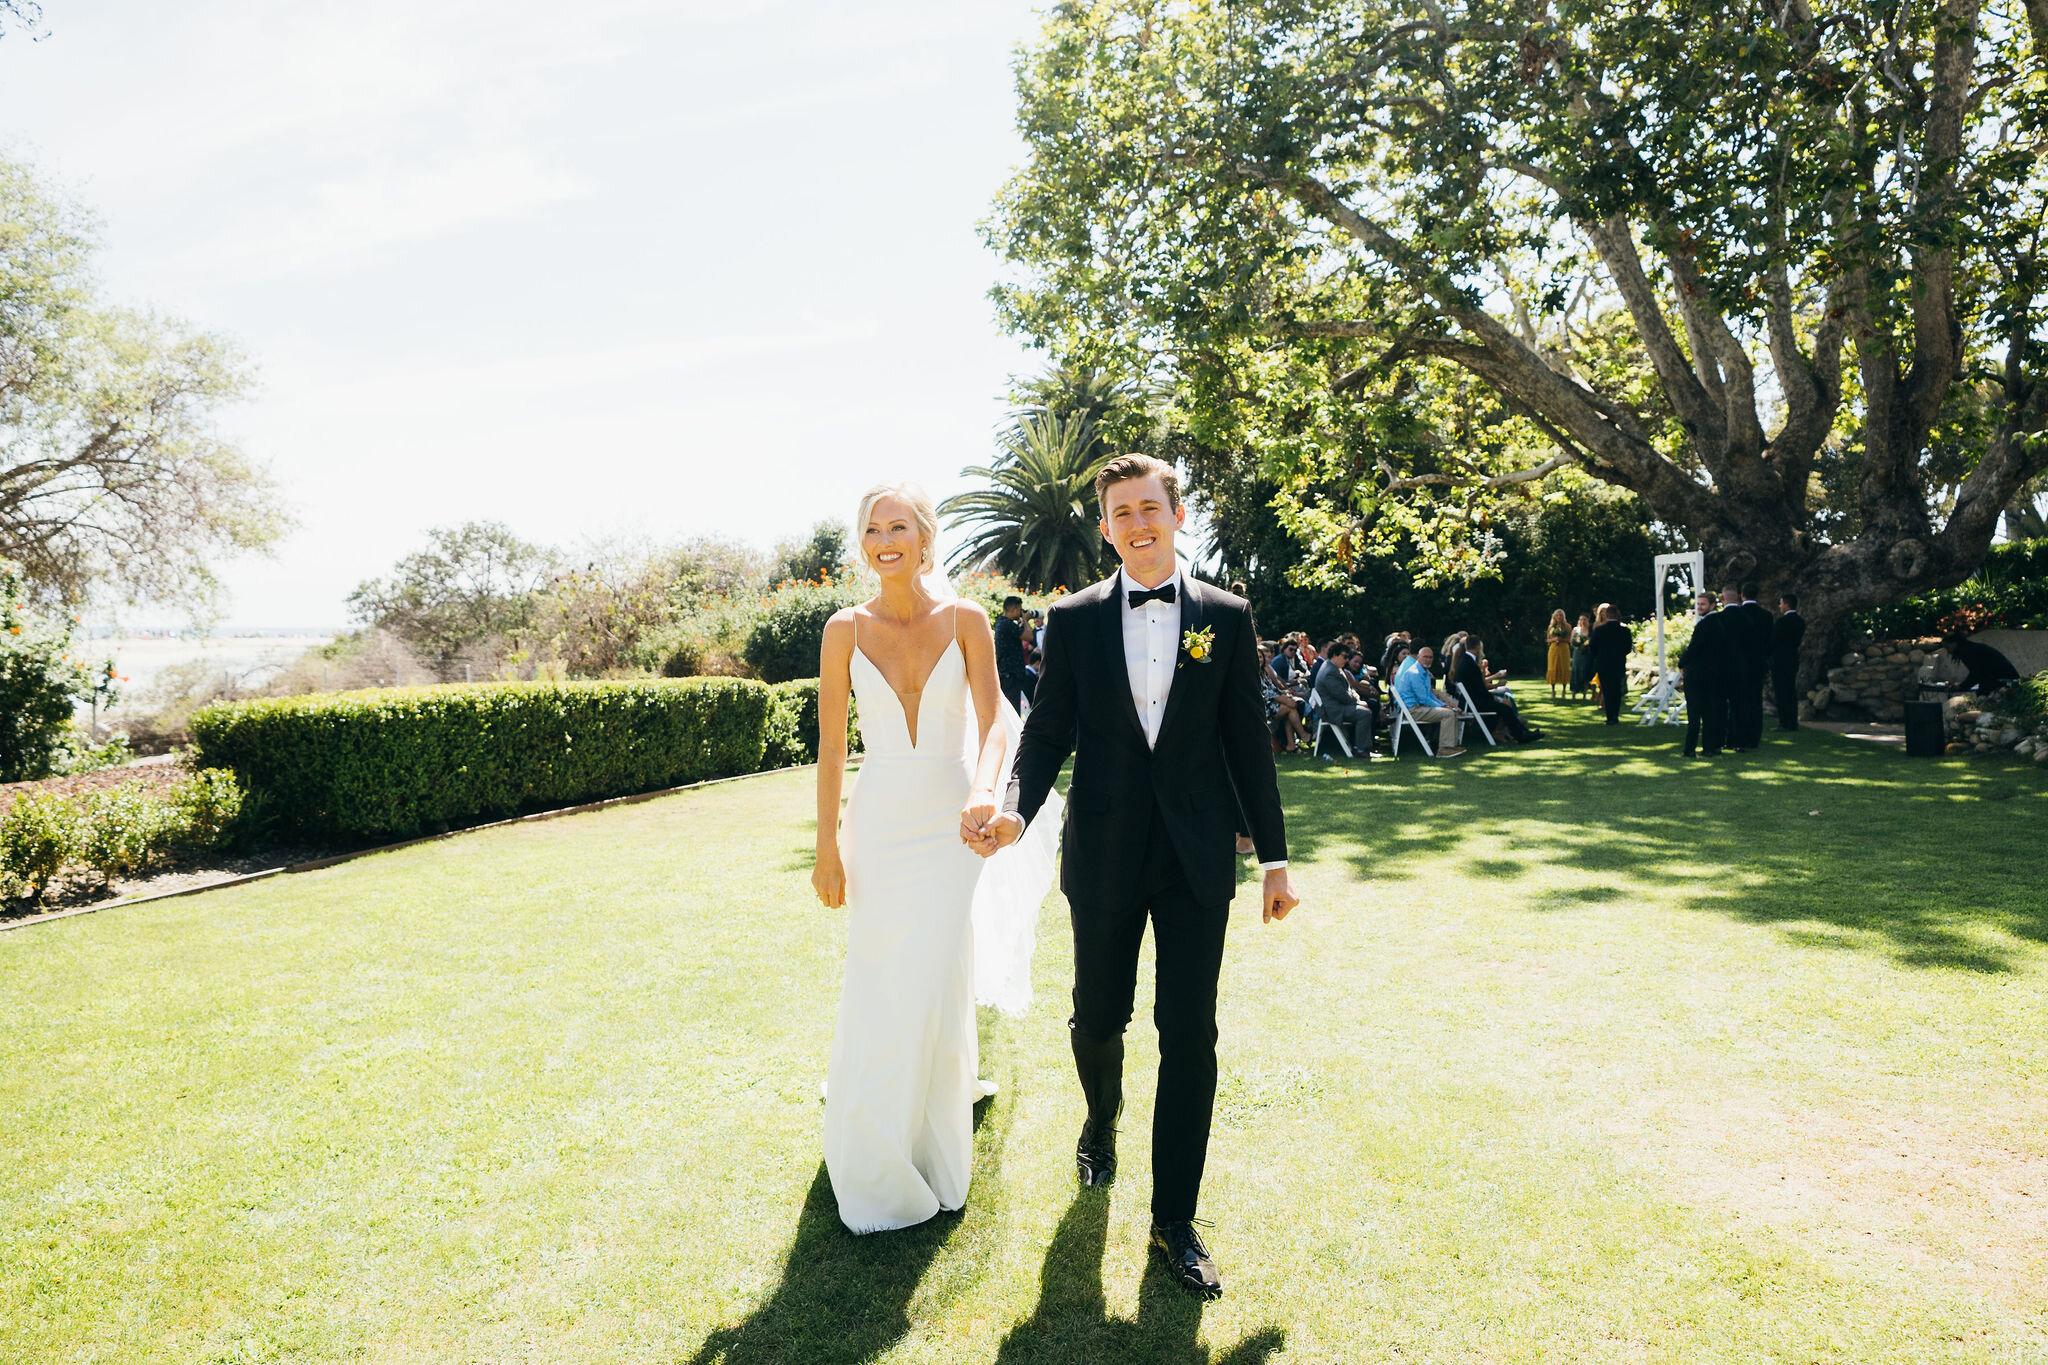 adamson-house-wedding-photography-085.jpg